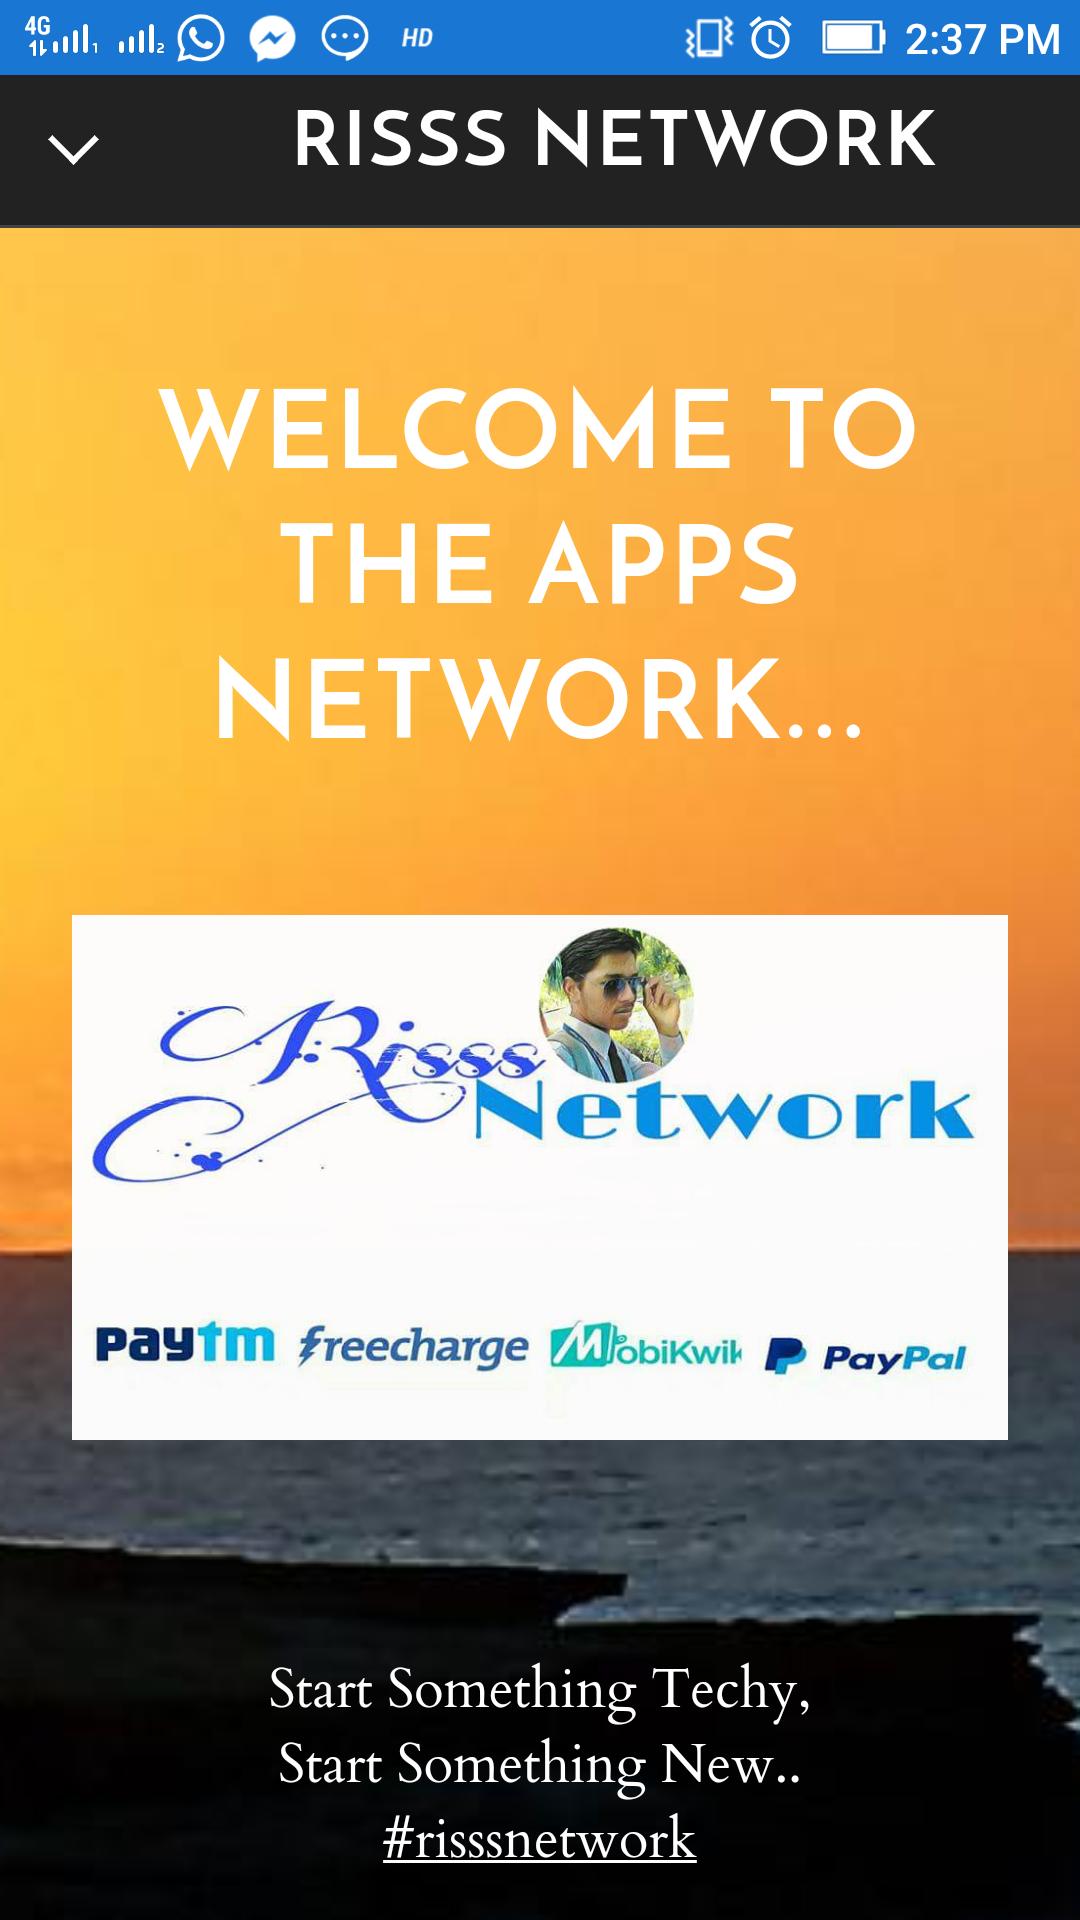 Risss Network Mobile